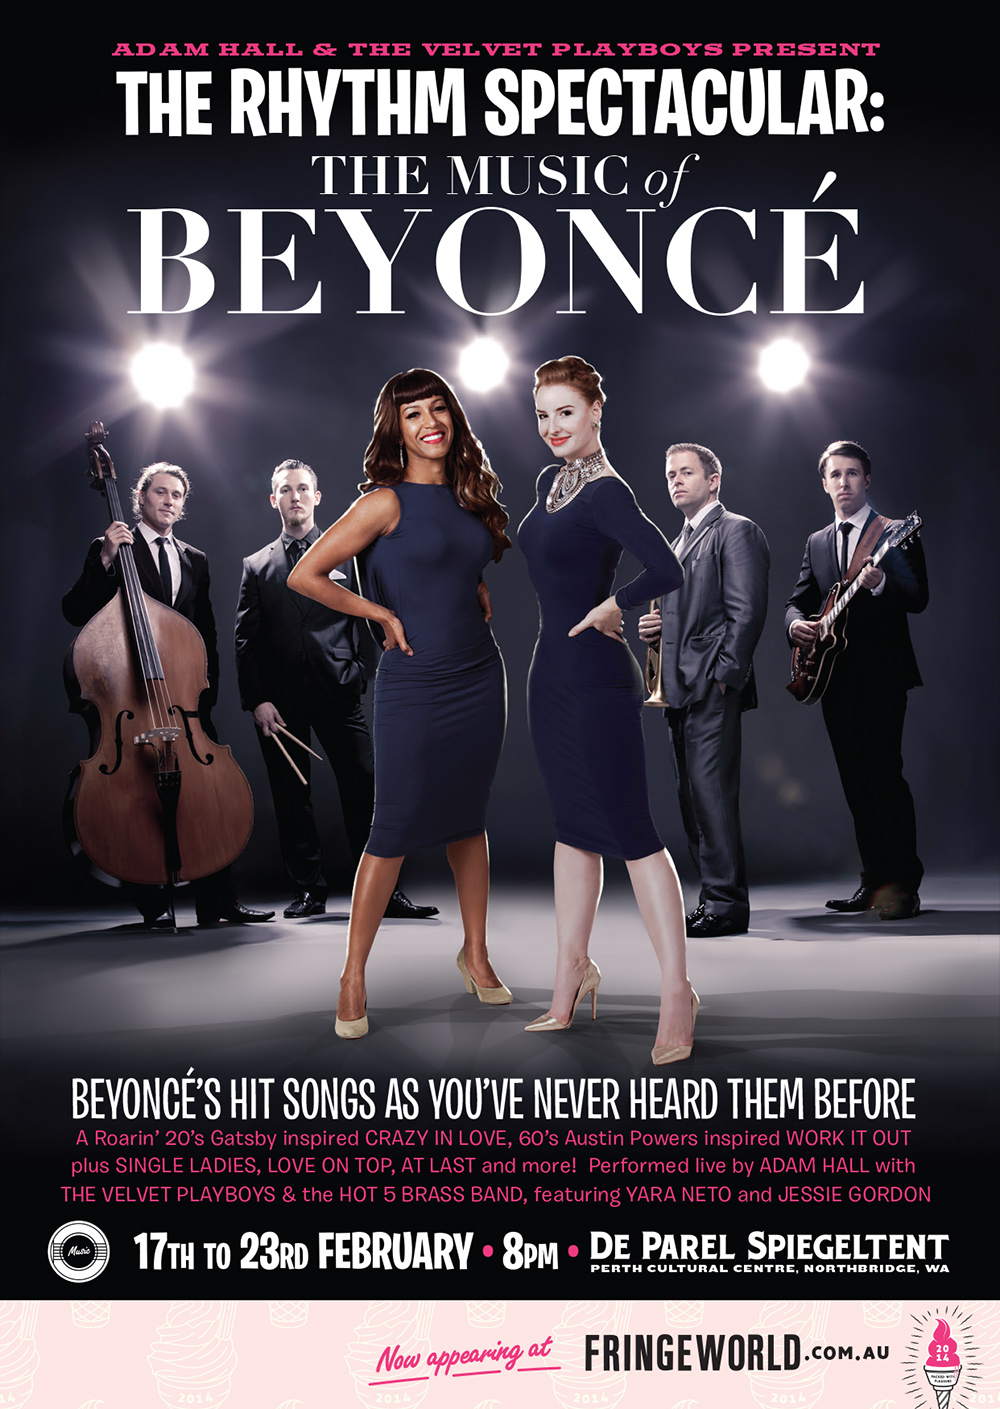 RhythmSpec_Beyonce_CMYKa6.jpg